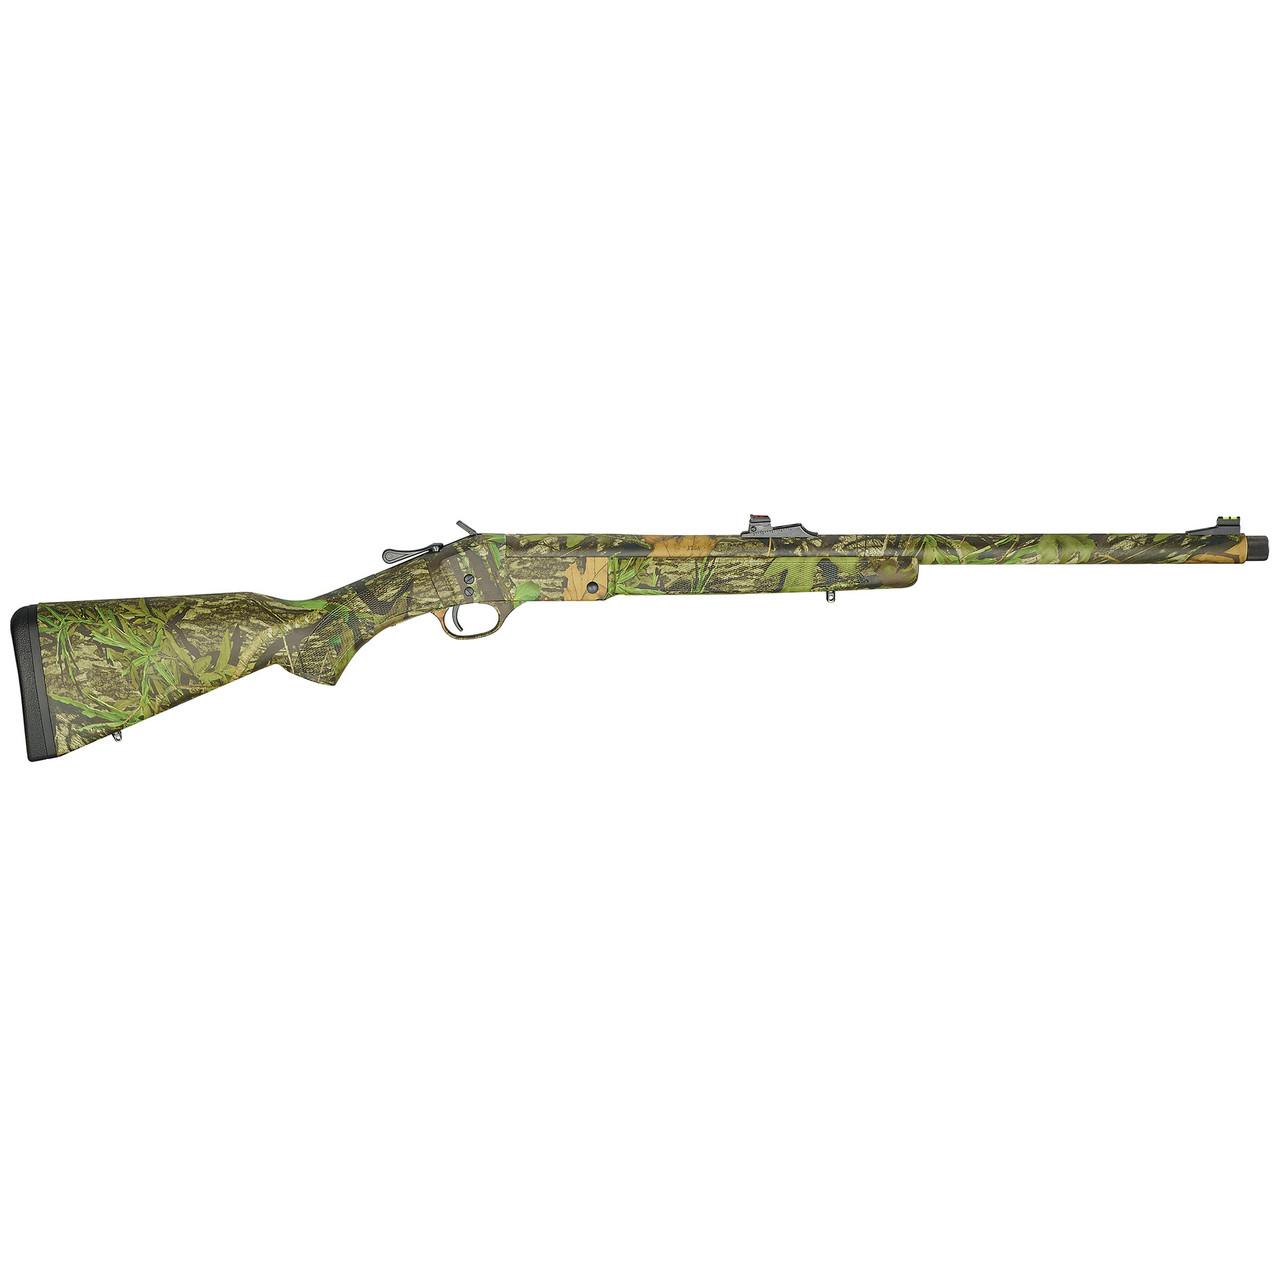 Henry Single Shot Shotgun CALIFORNIA LEGAL - 12ga - Mossy Oak Obsession Camo